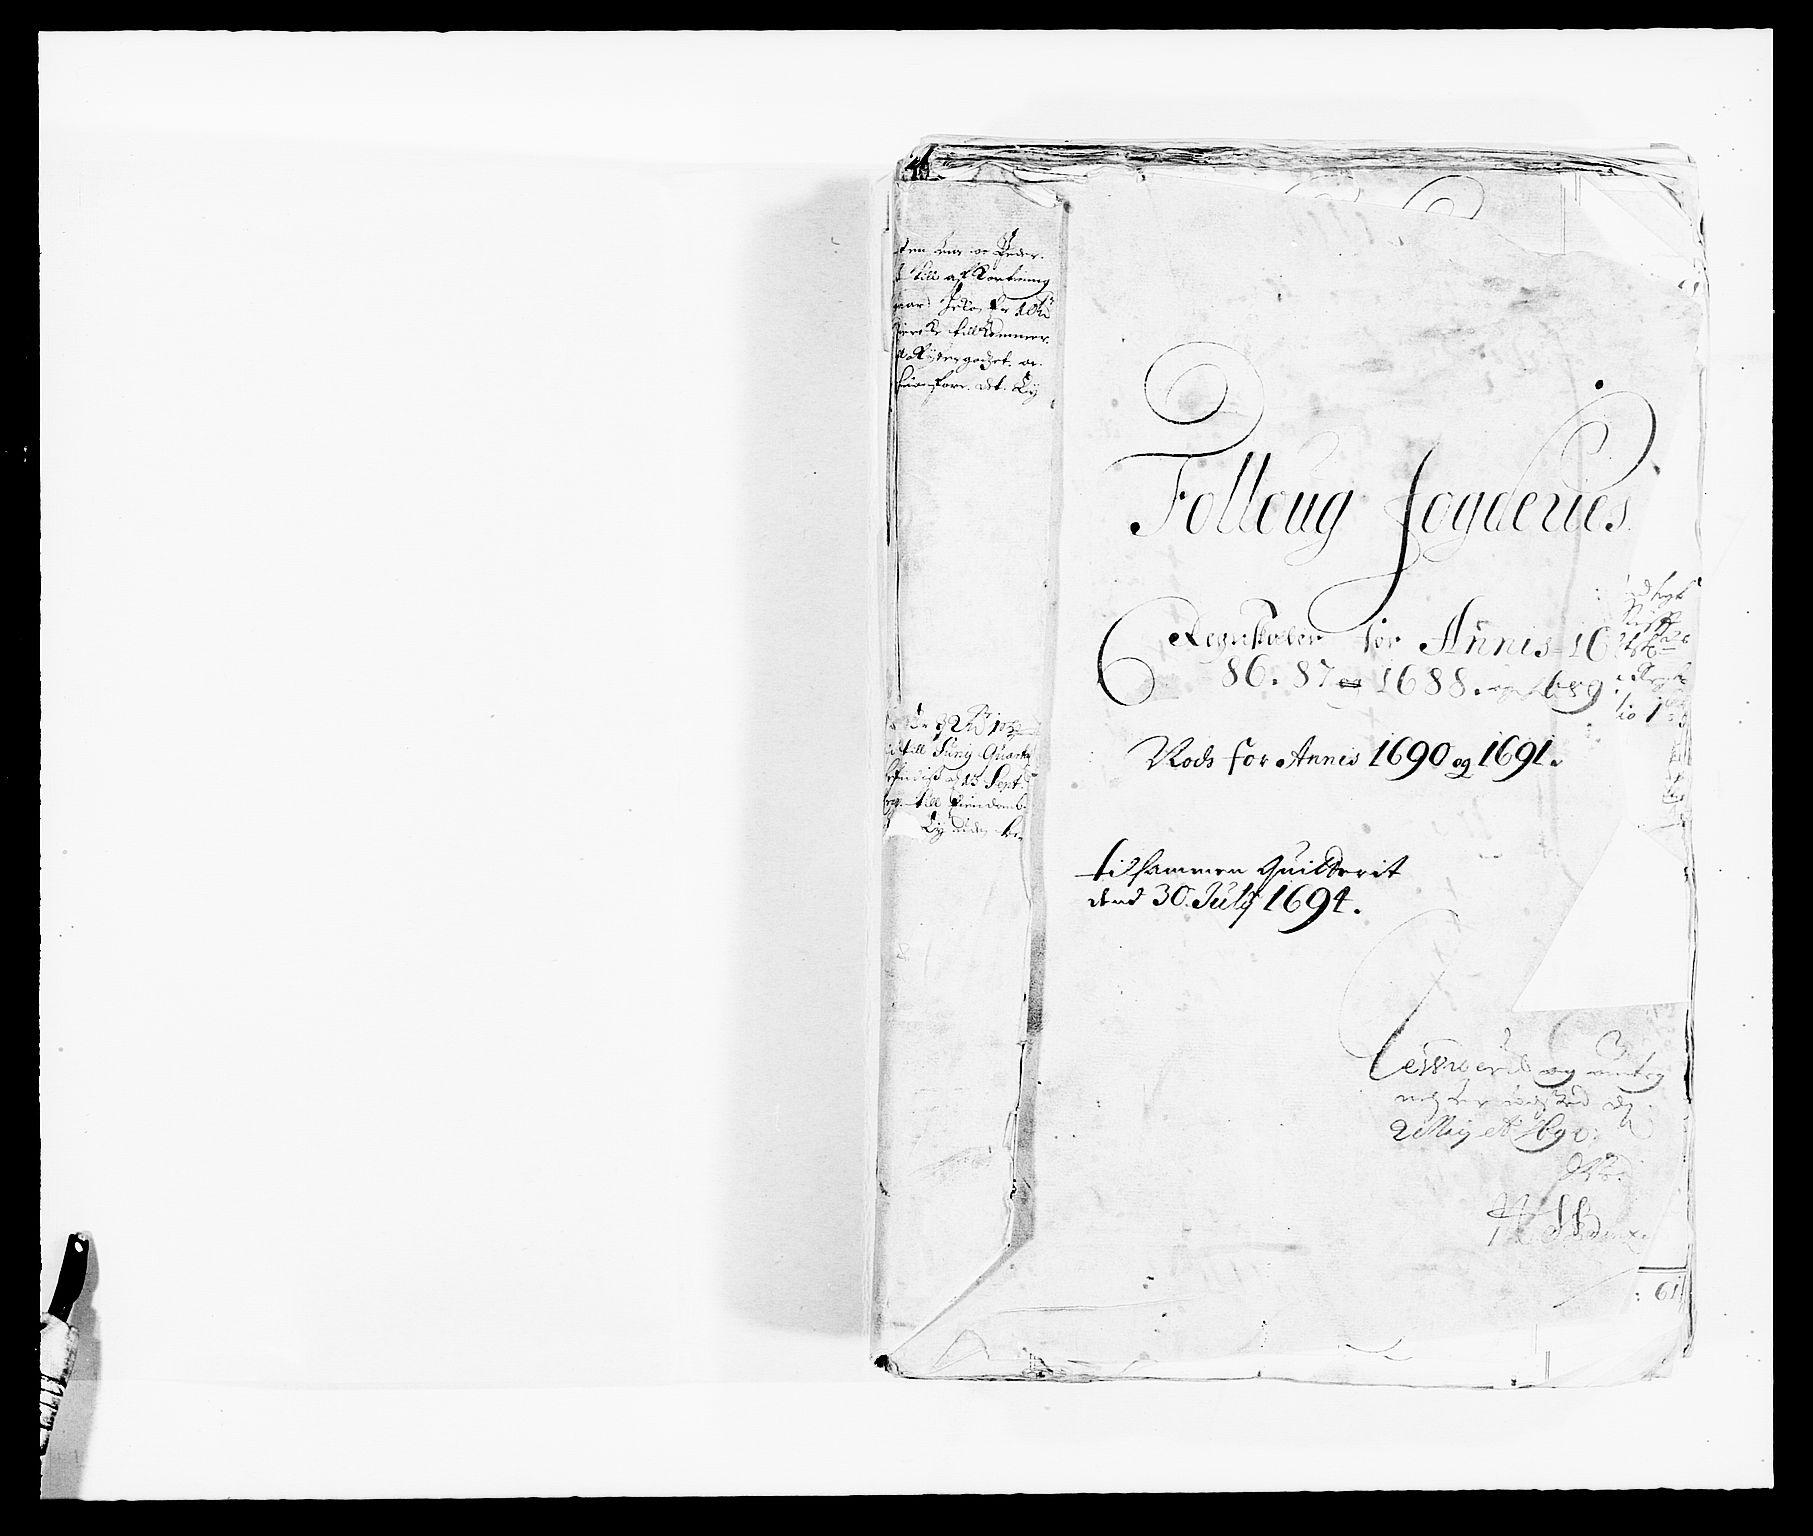 RA, Rentekammeret inntil 1814, Reviderte regnskaper, Fogderegnskap, R09/L0436: Fogderegnskap Follo, 1685-1691, s. 2